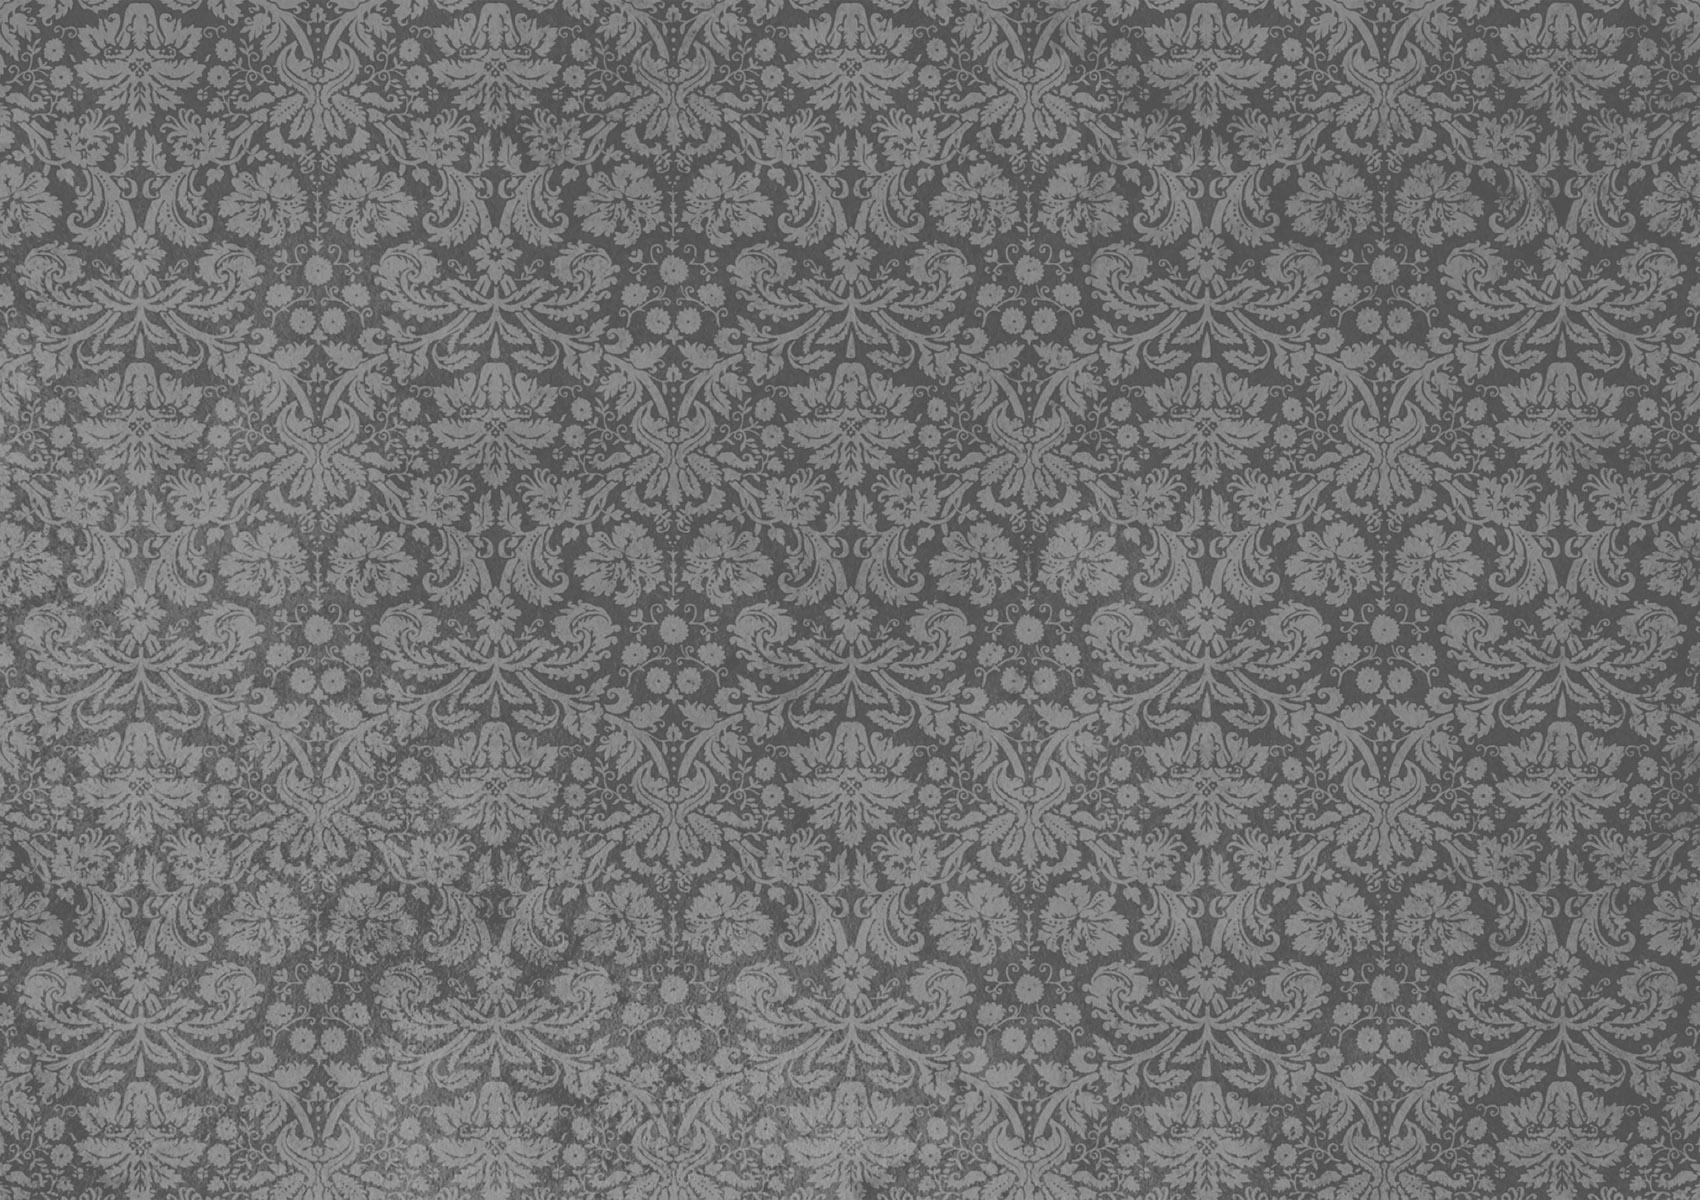 Decorative Wallpaper Wallpaper Wickes Wallpaper Computer Wallpapers